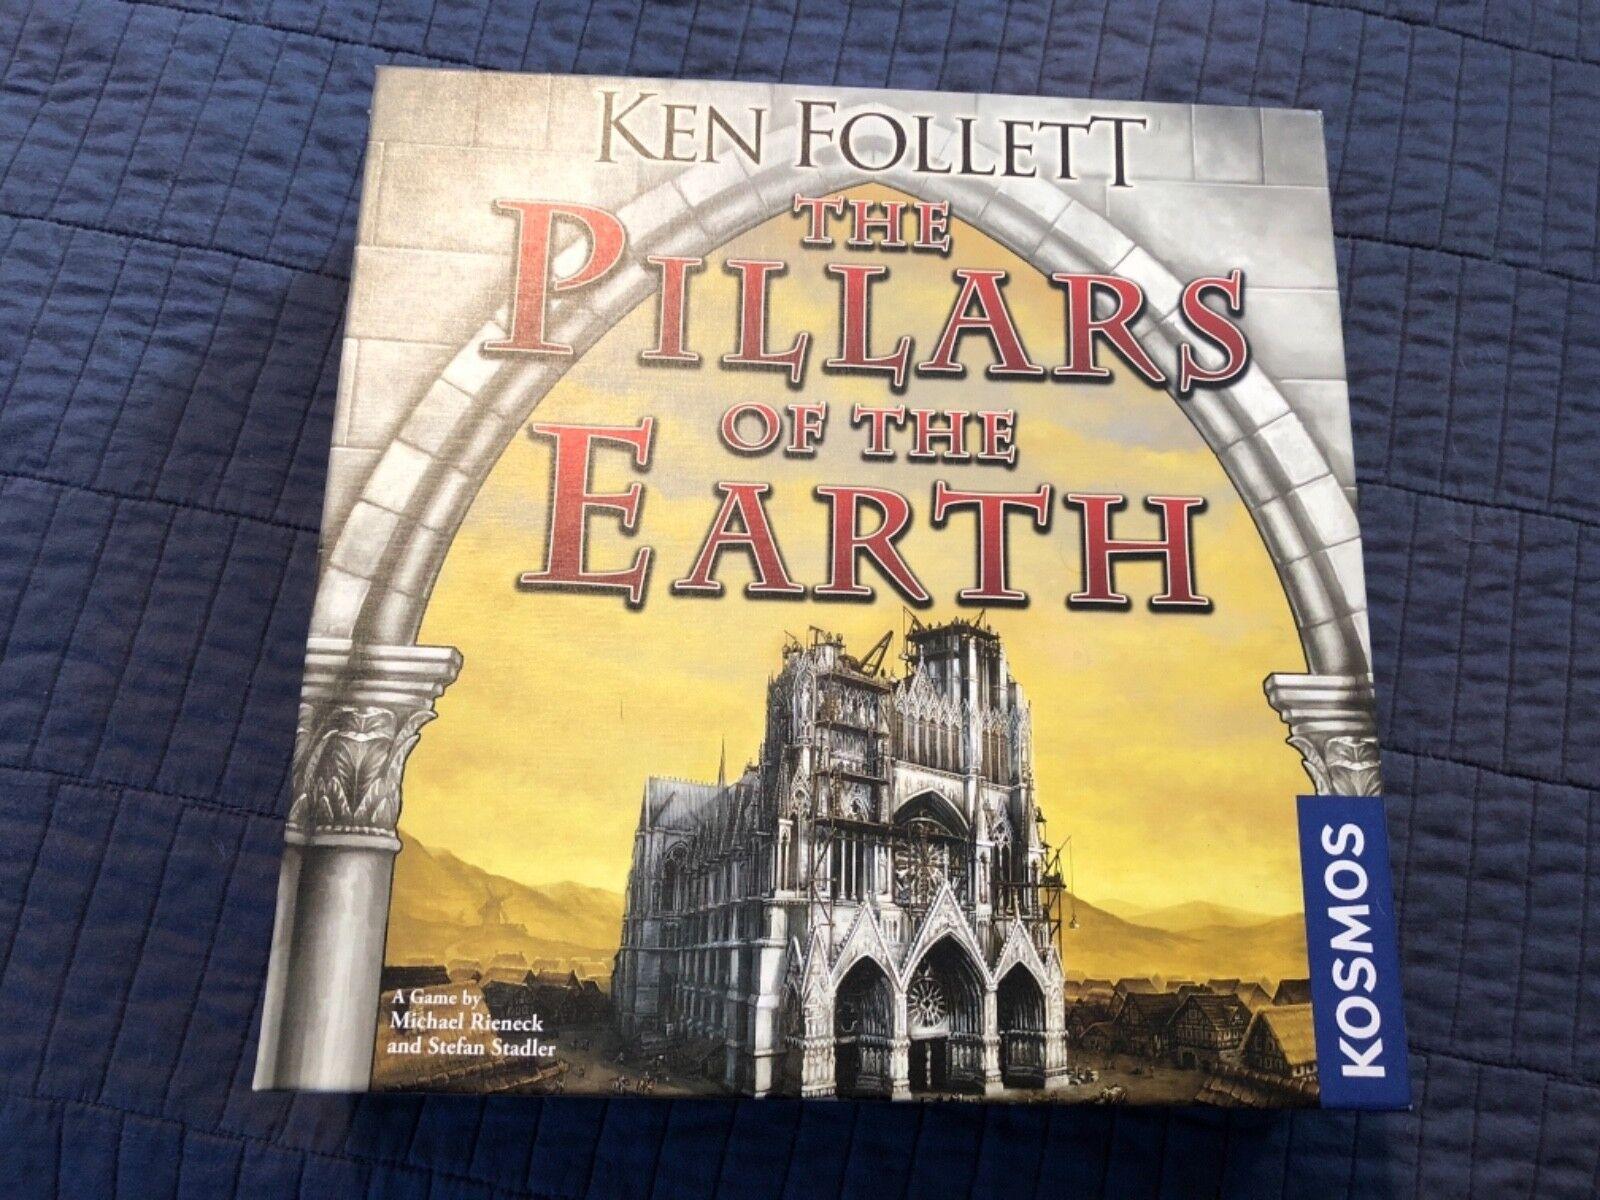 Ken Follett The Pillars of the Ekonsth Board spel New and Perfect